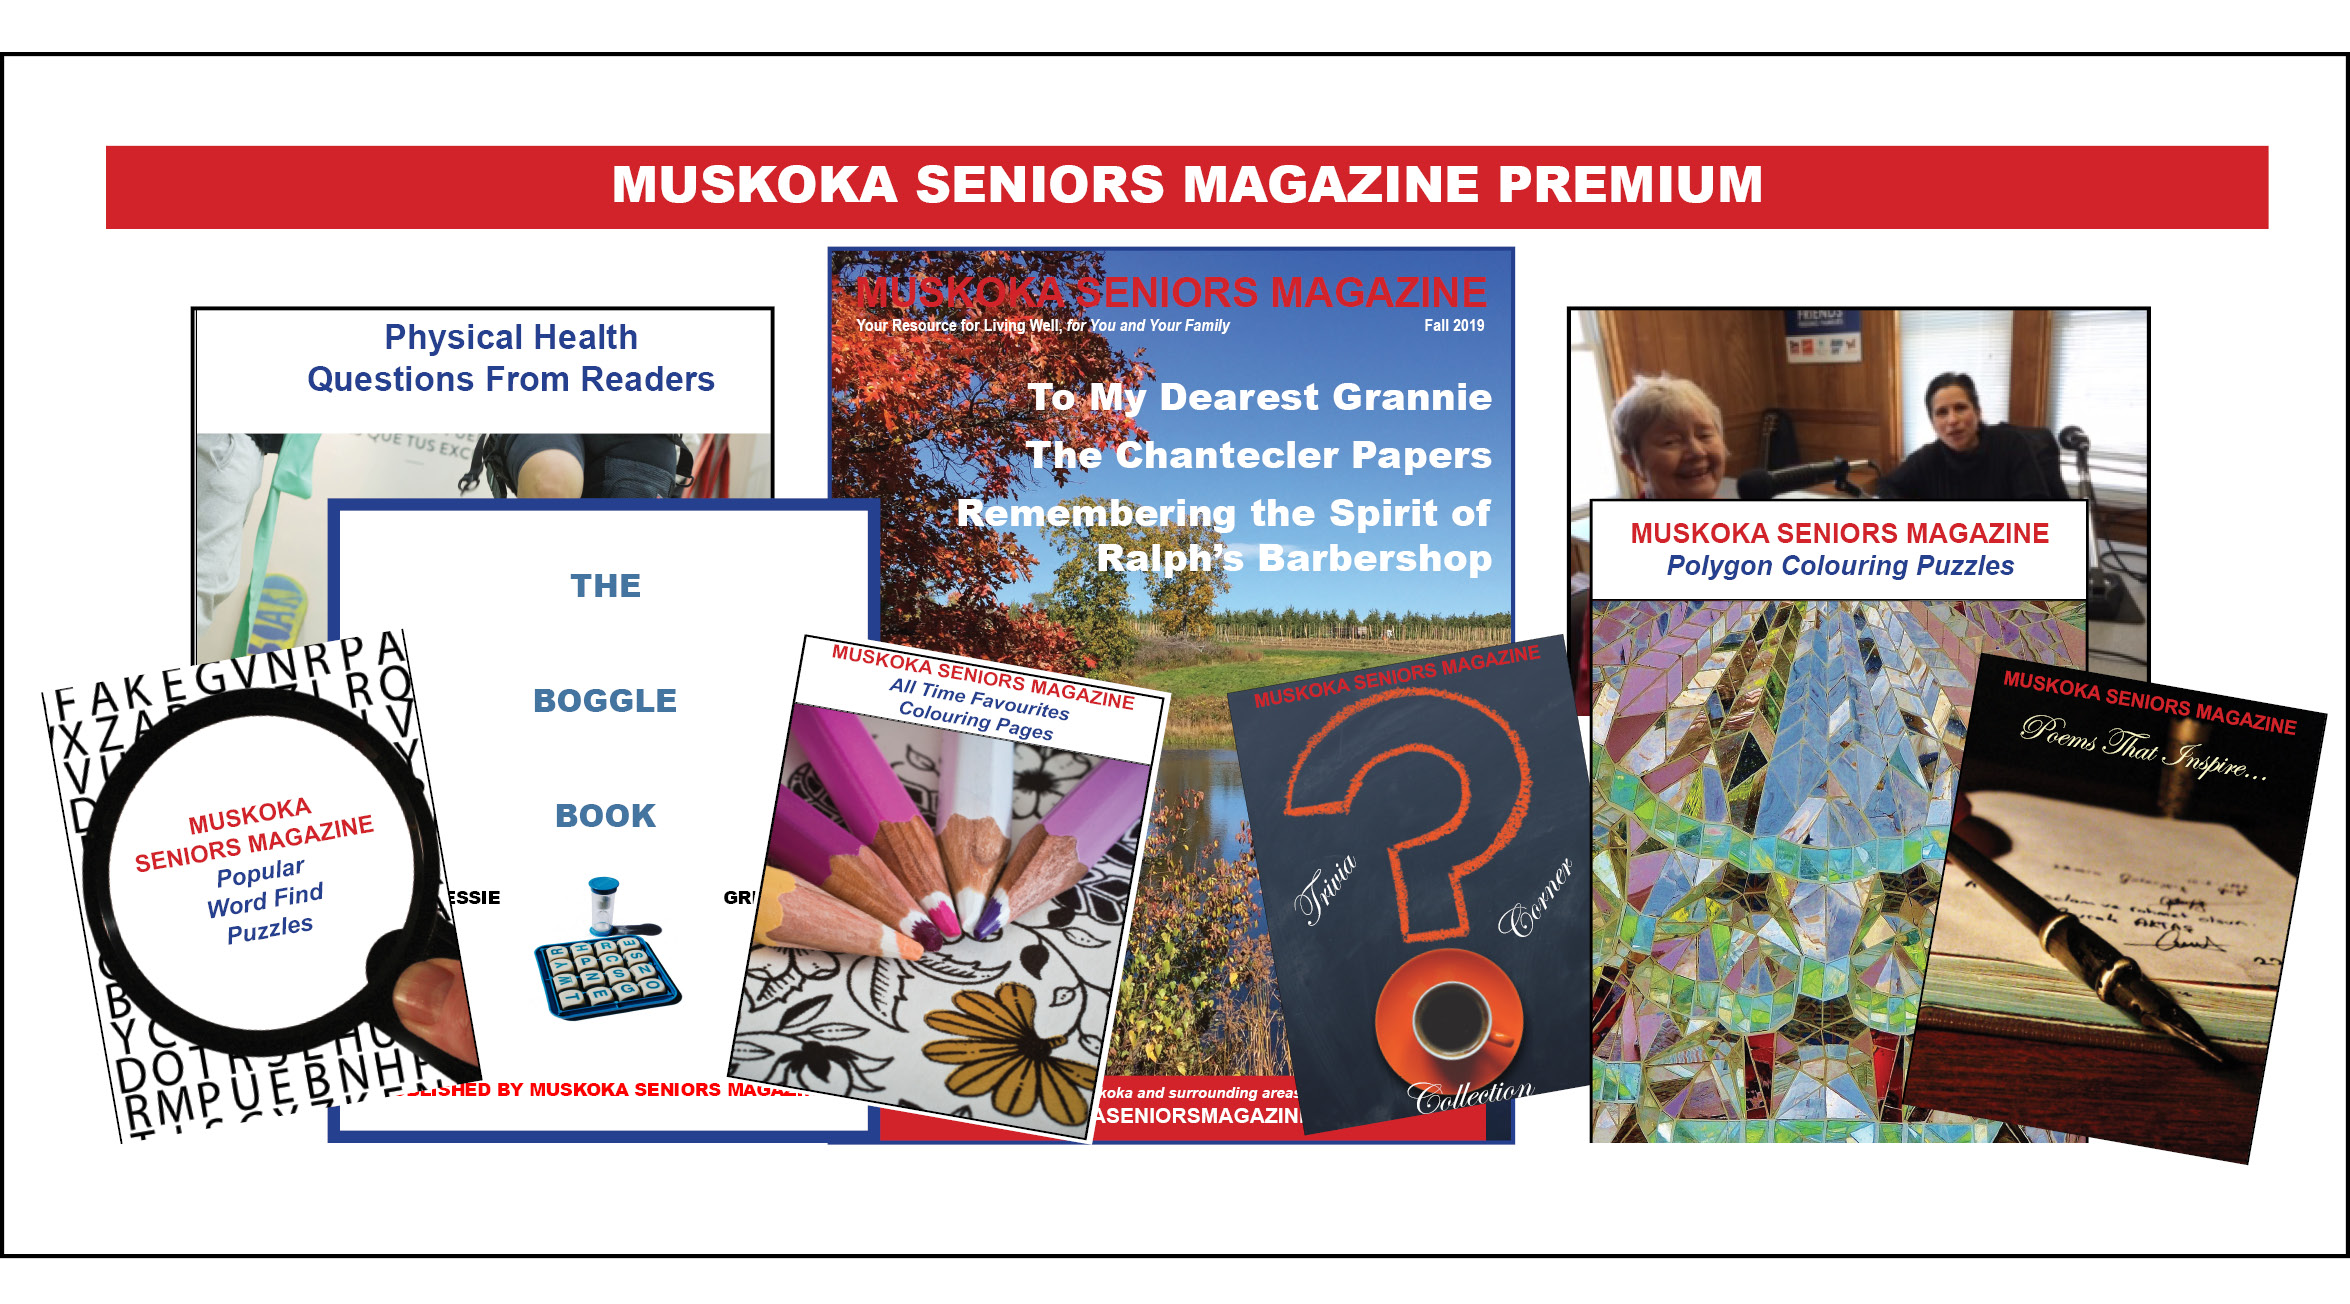 Muskoka Seniors Magazine Premium Muskoka Seniors Magazine